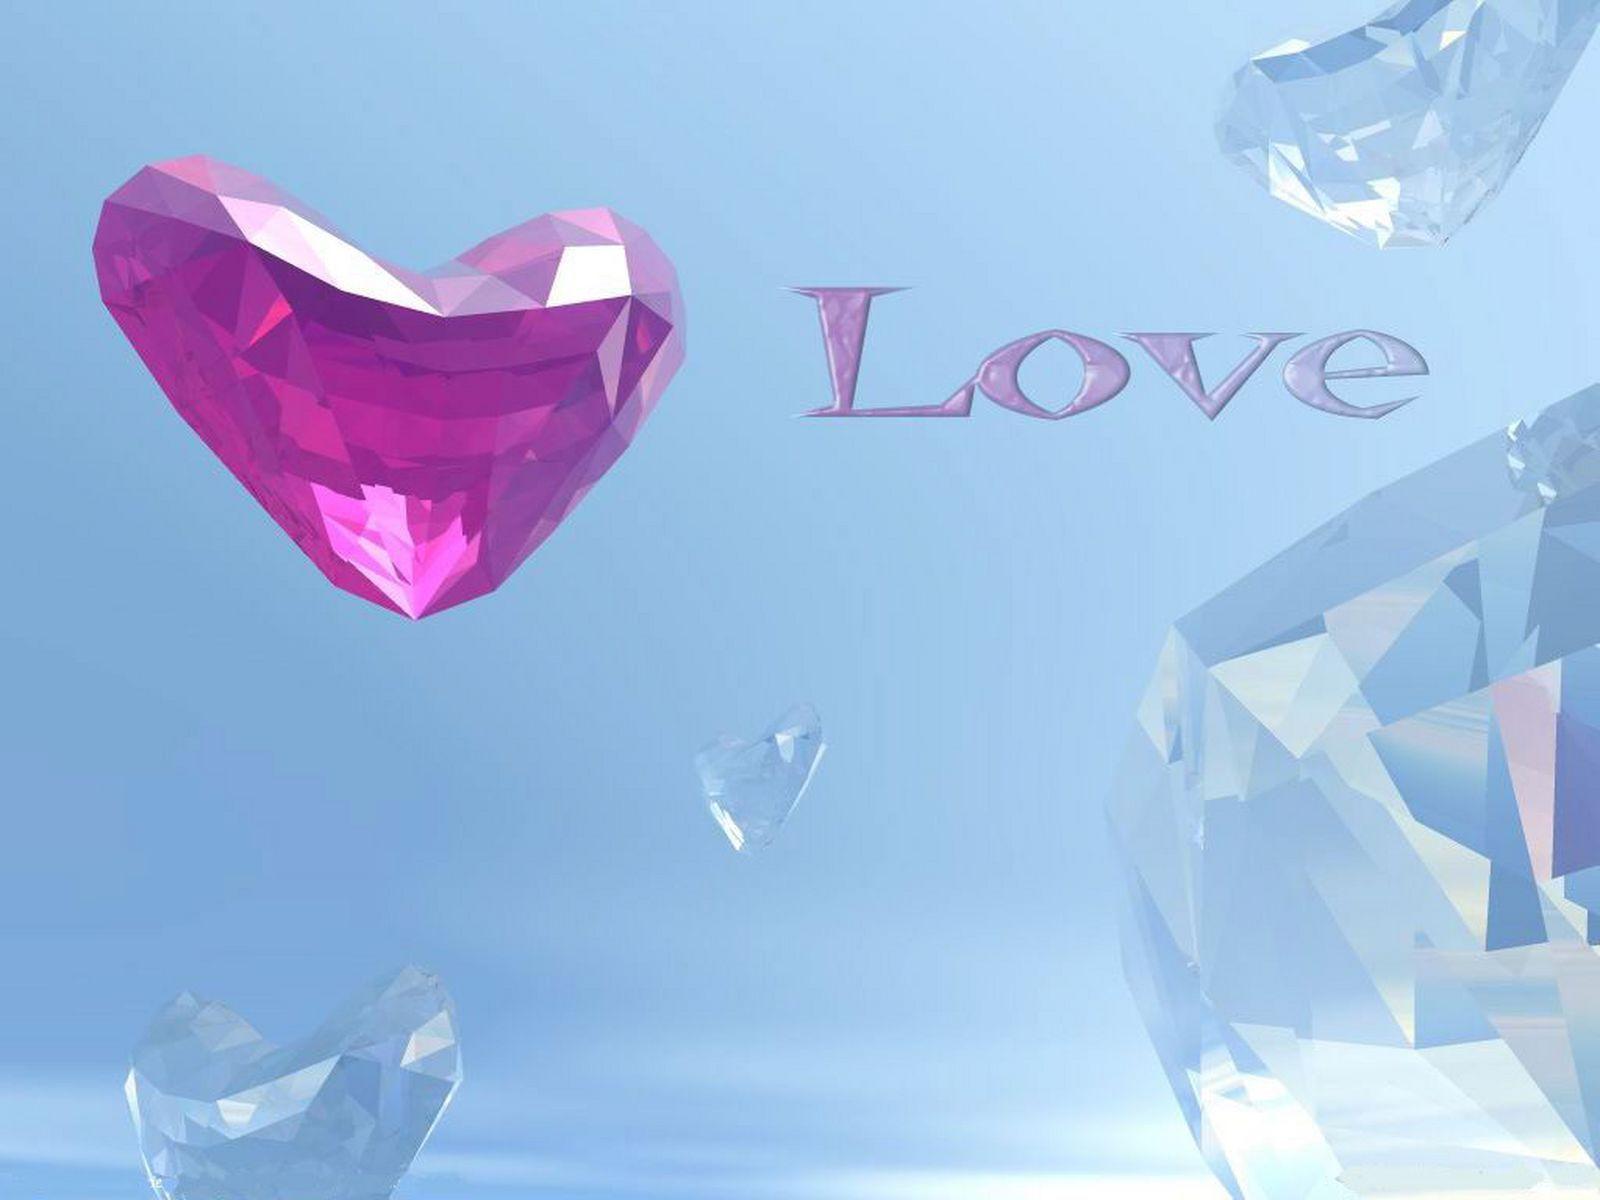 Painful Love Wallpaper Desktop : Wallpaper love picture Amazing Wallpapers